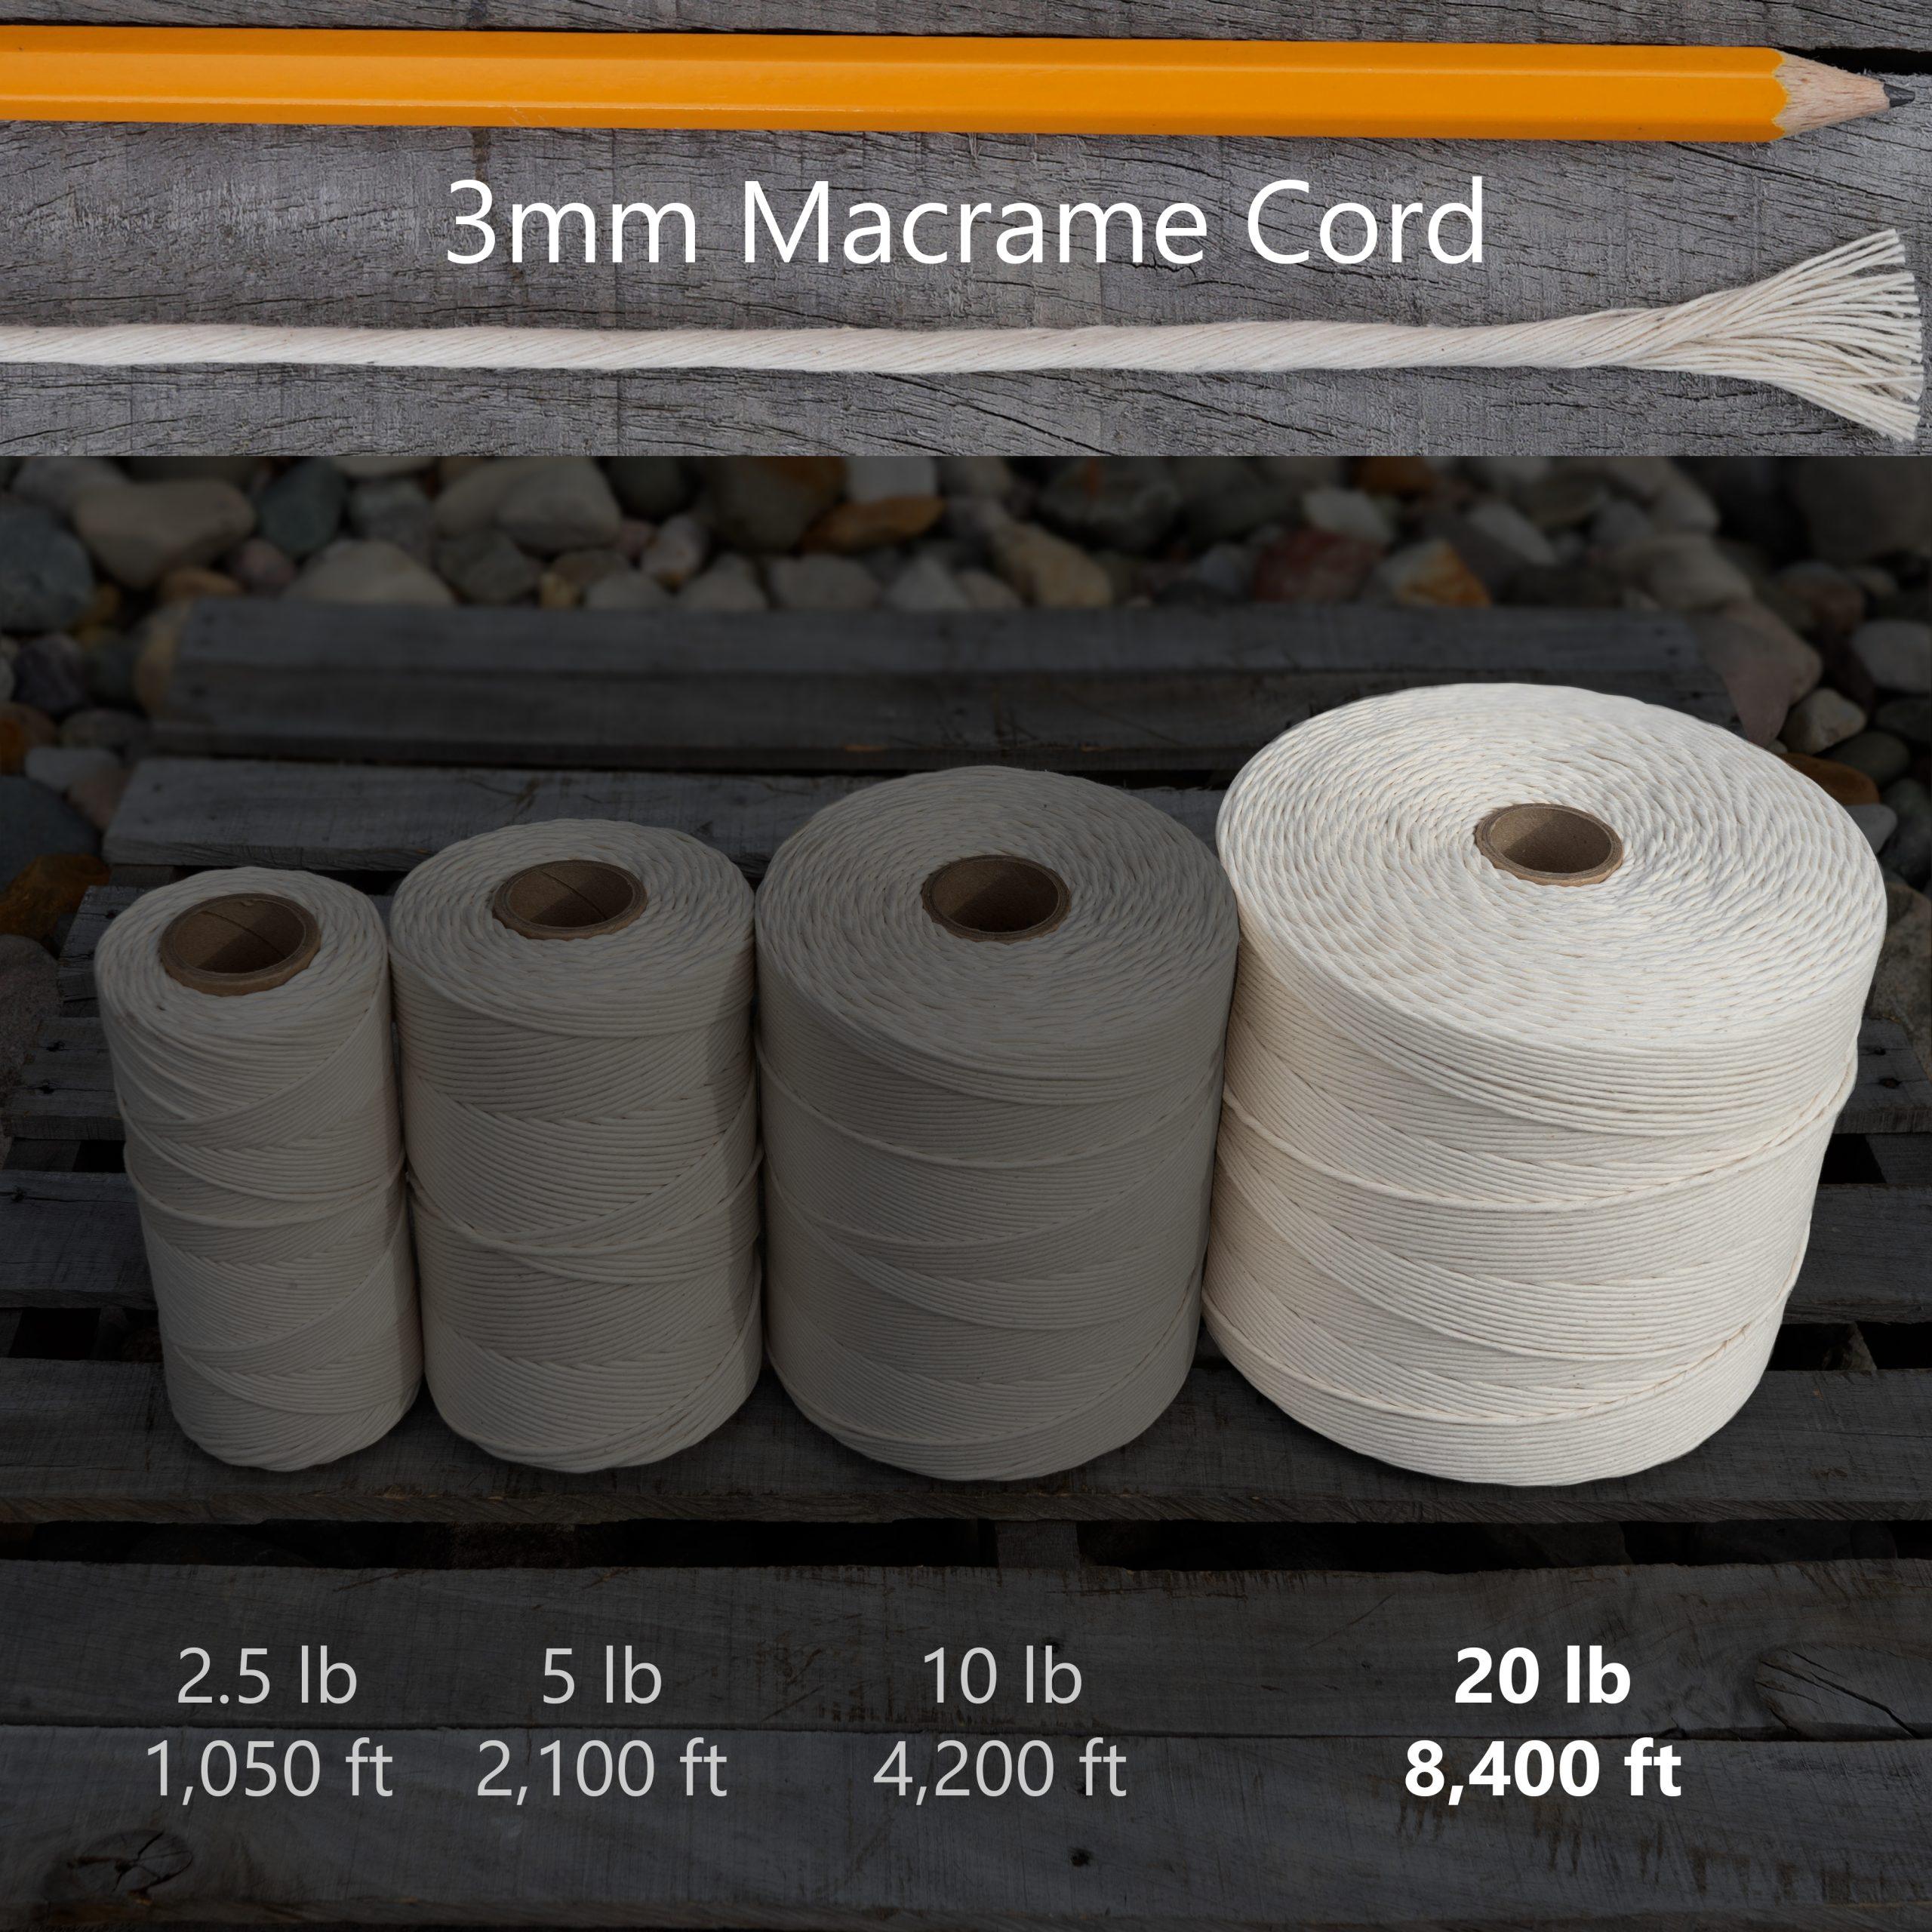 3 mm x 20 lb macrame tube